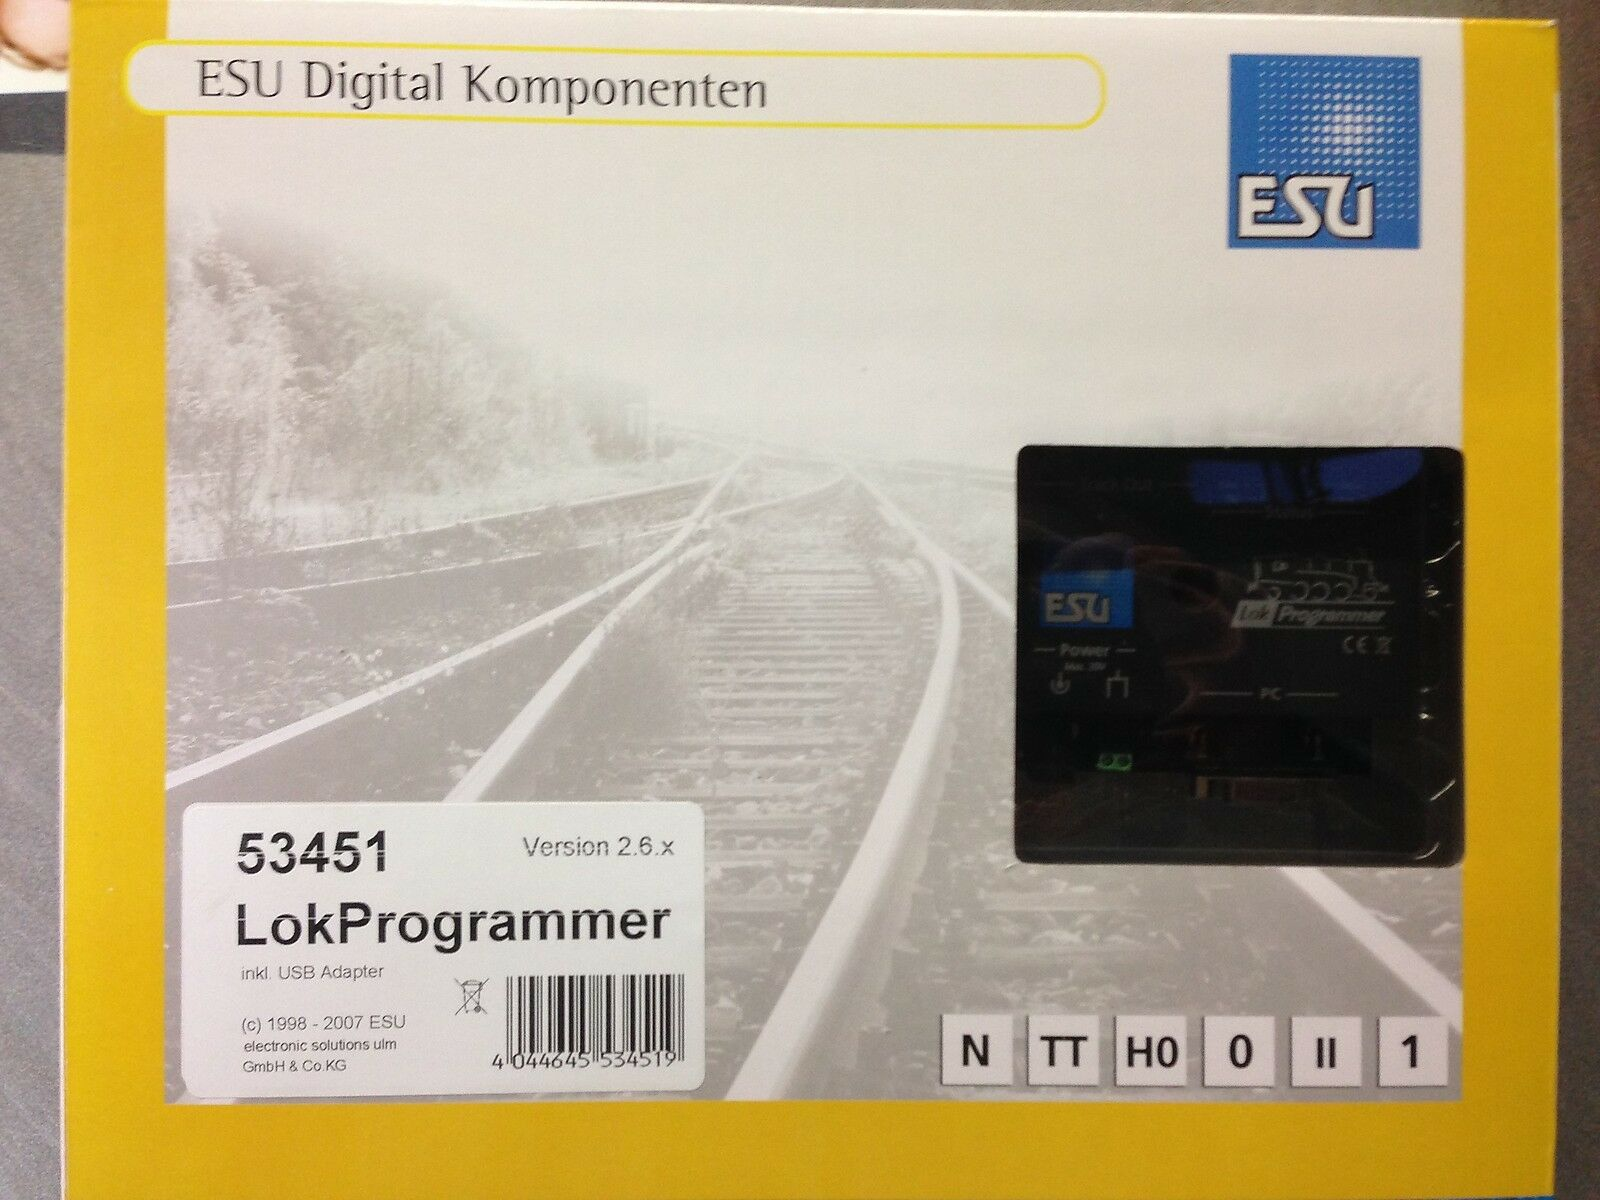 +++ esu 53451 lokprogrammer incl. adaptador USB